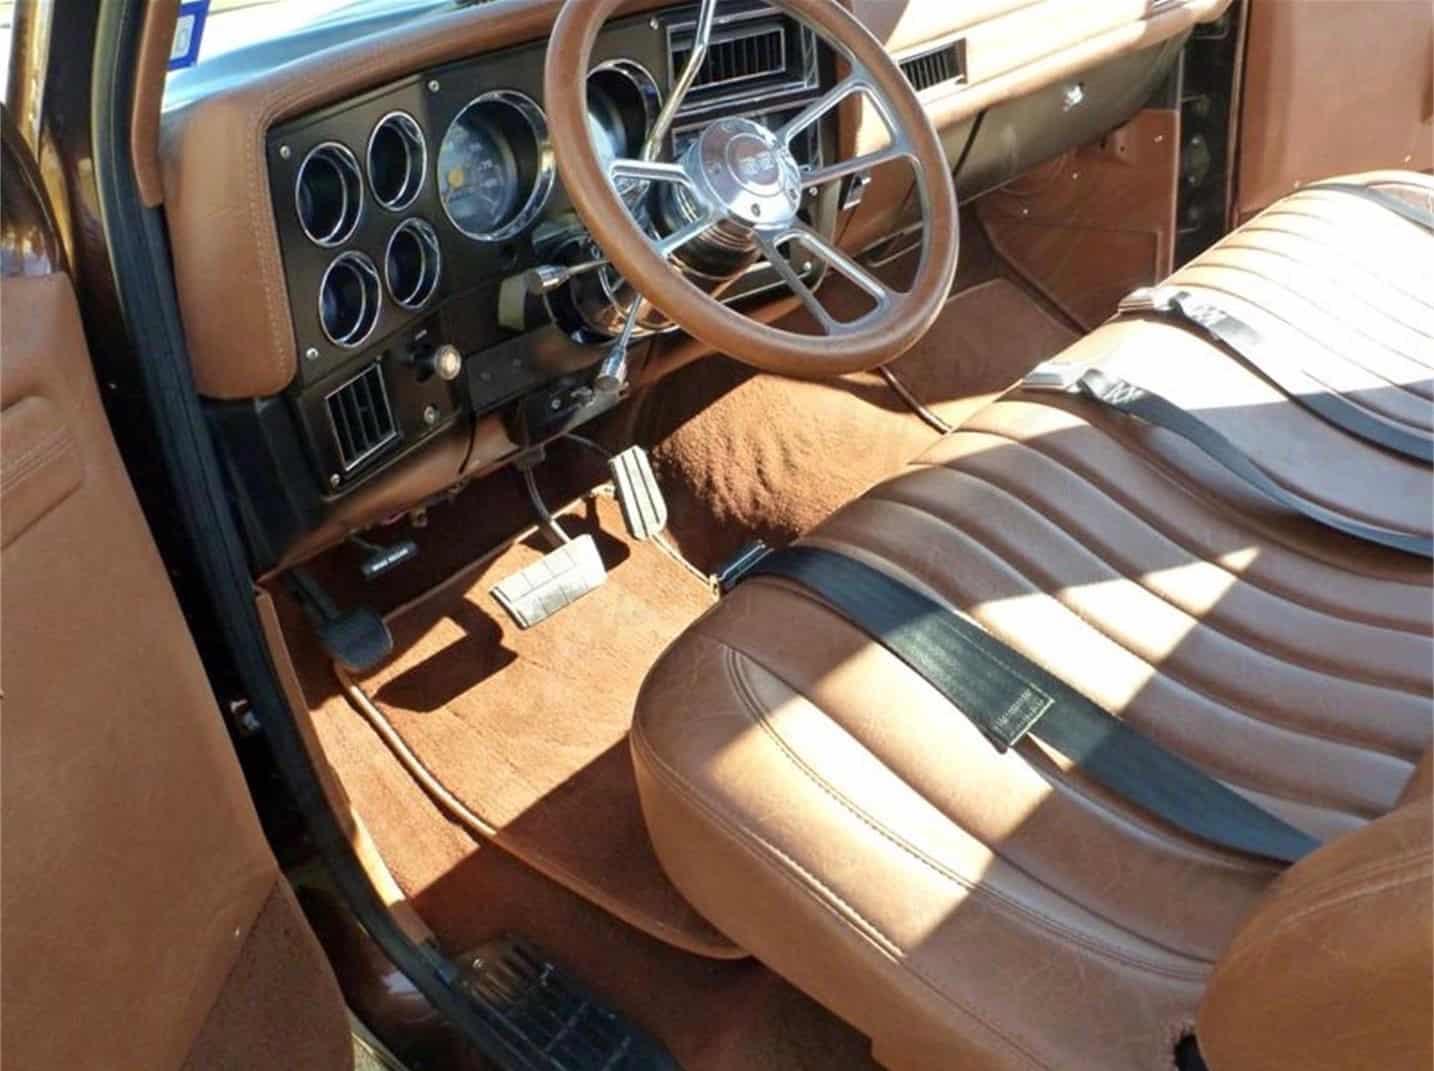 1987 Chevrolet Silverado R10, Remember when Chevy built R/V pickup trucks?, ClassicCars.com Journal